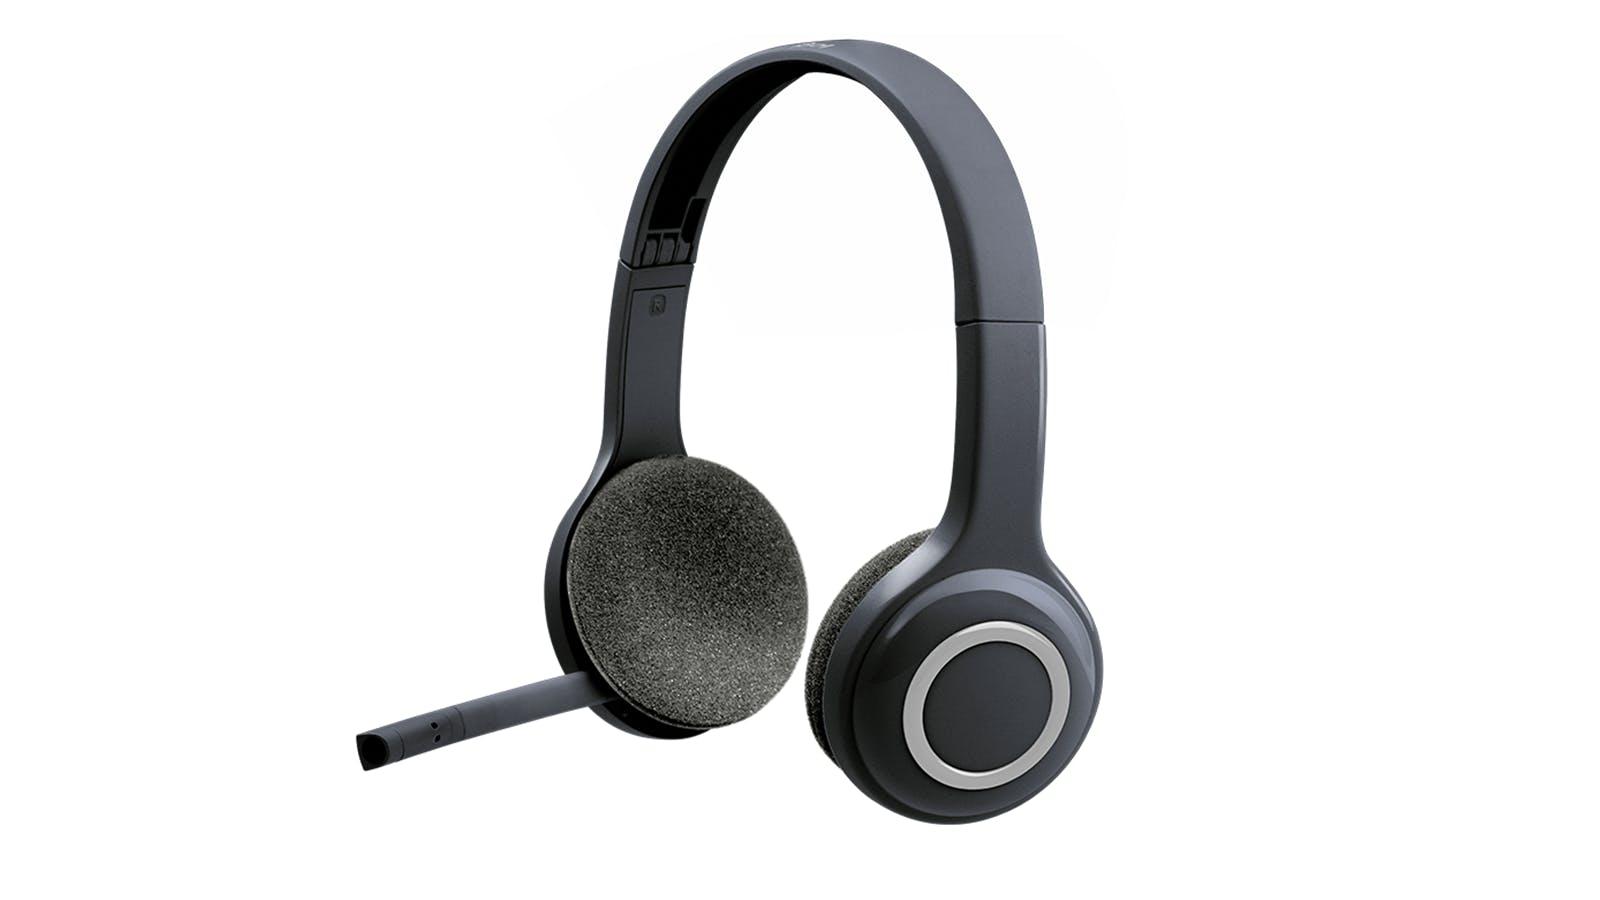 Home :: TV & Audio :: Headphones :: On-Ear Headphones :: Logitech H600  Wireless Headset